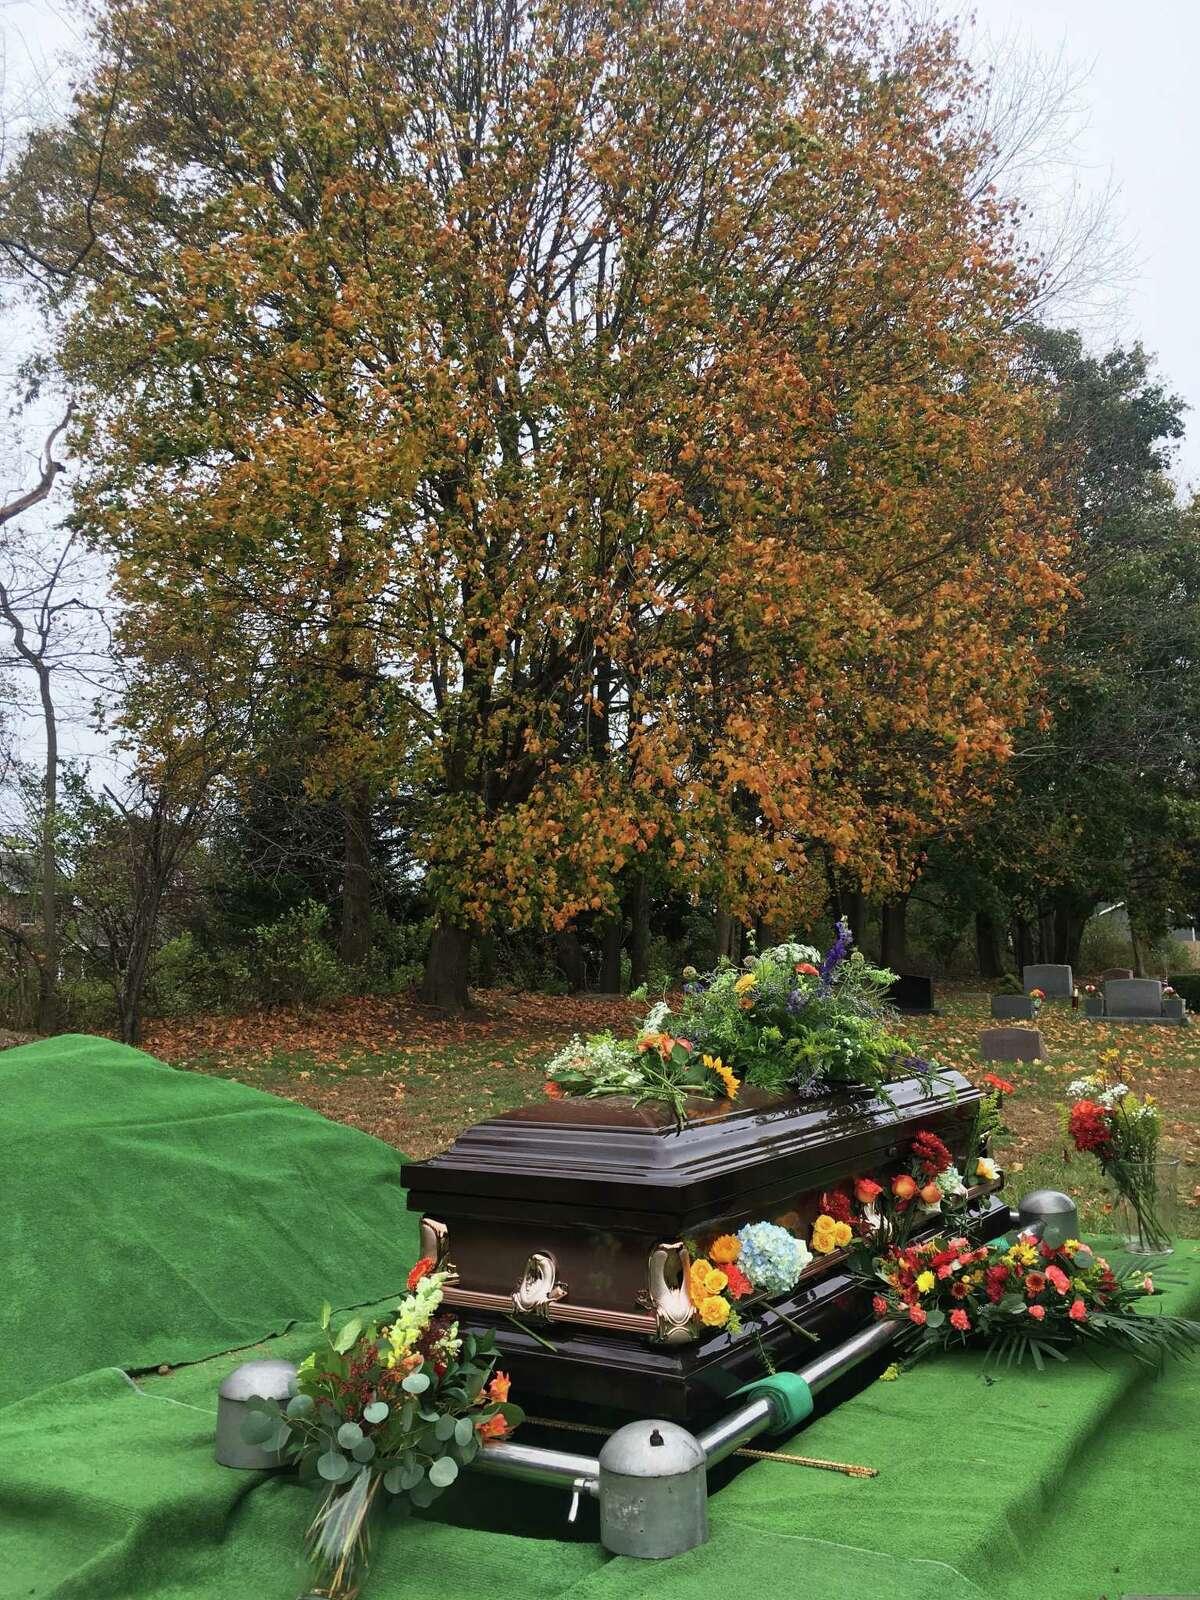 Chris Bramah's grave in Kinderhook Cemetery on Nov. 4, 2019. (Steve Barnes/Times Union.)